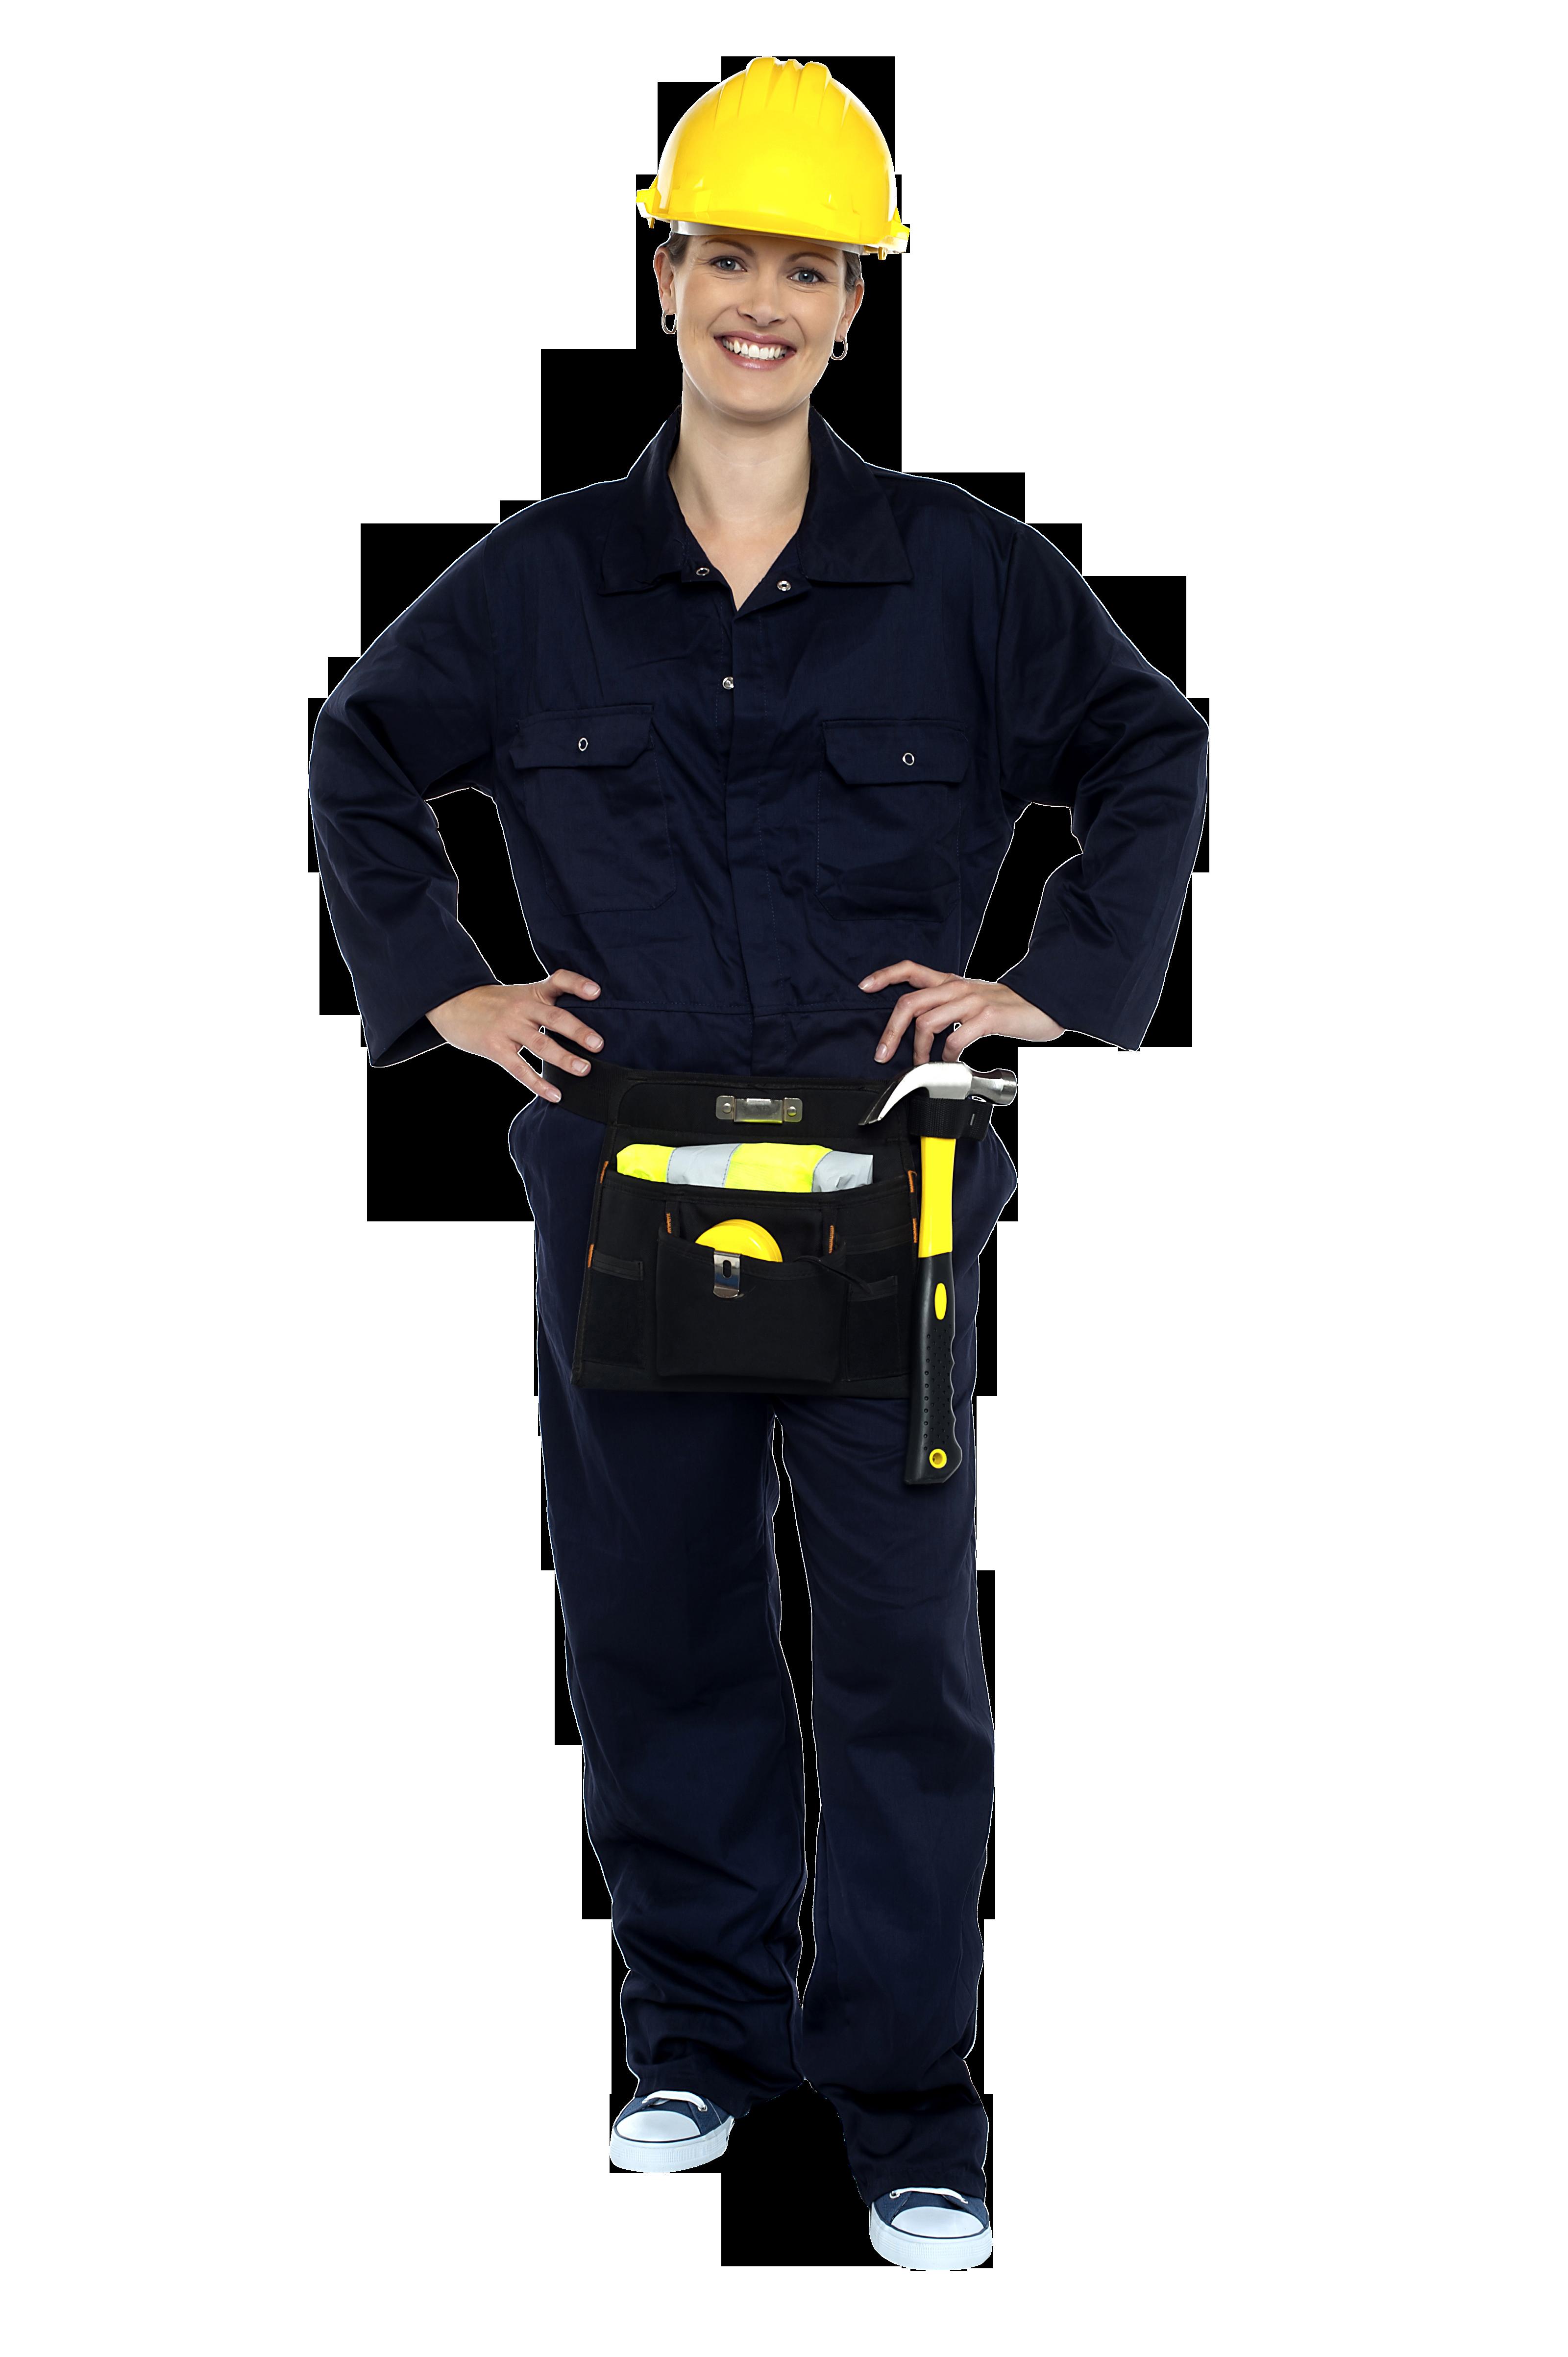 Engineer clipart woman engineer. Women worker png image